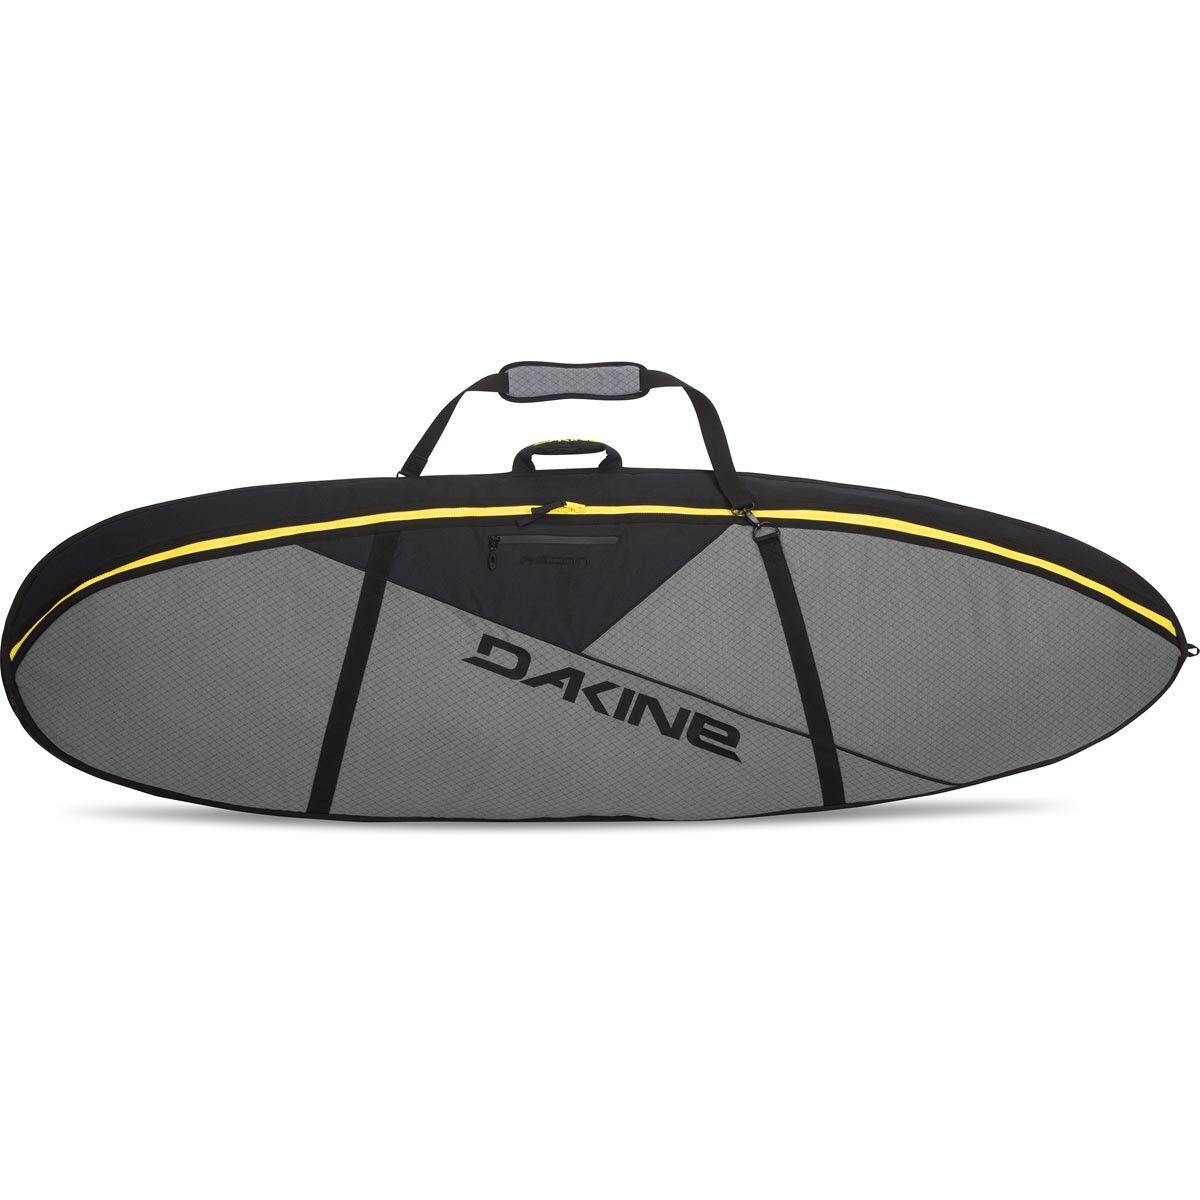 Dakine Recon Double Surfboard Bag Thruster 7'6'' Surf Boardbag Carbon